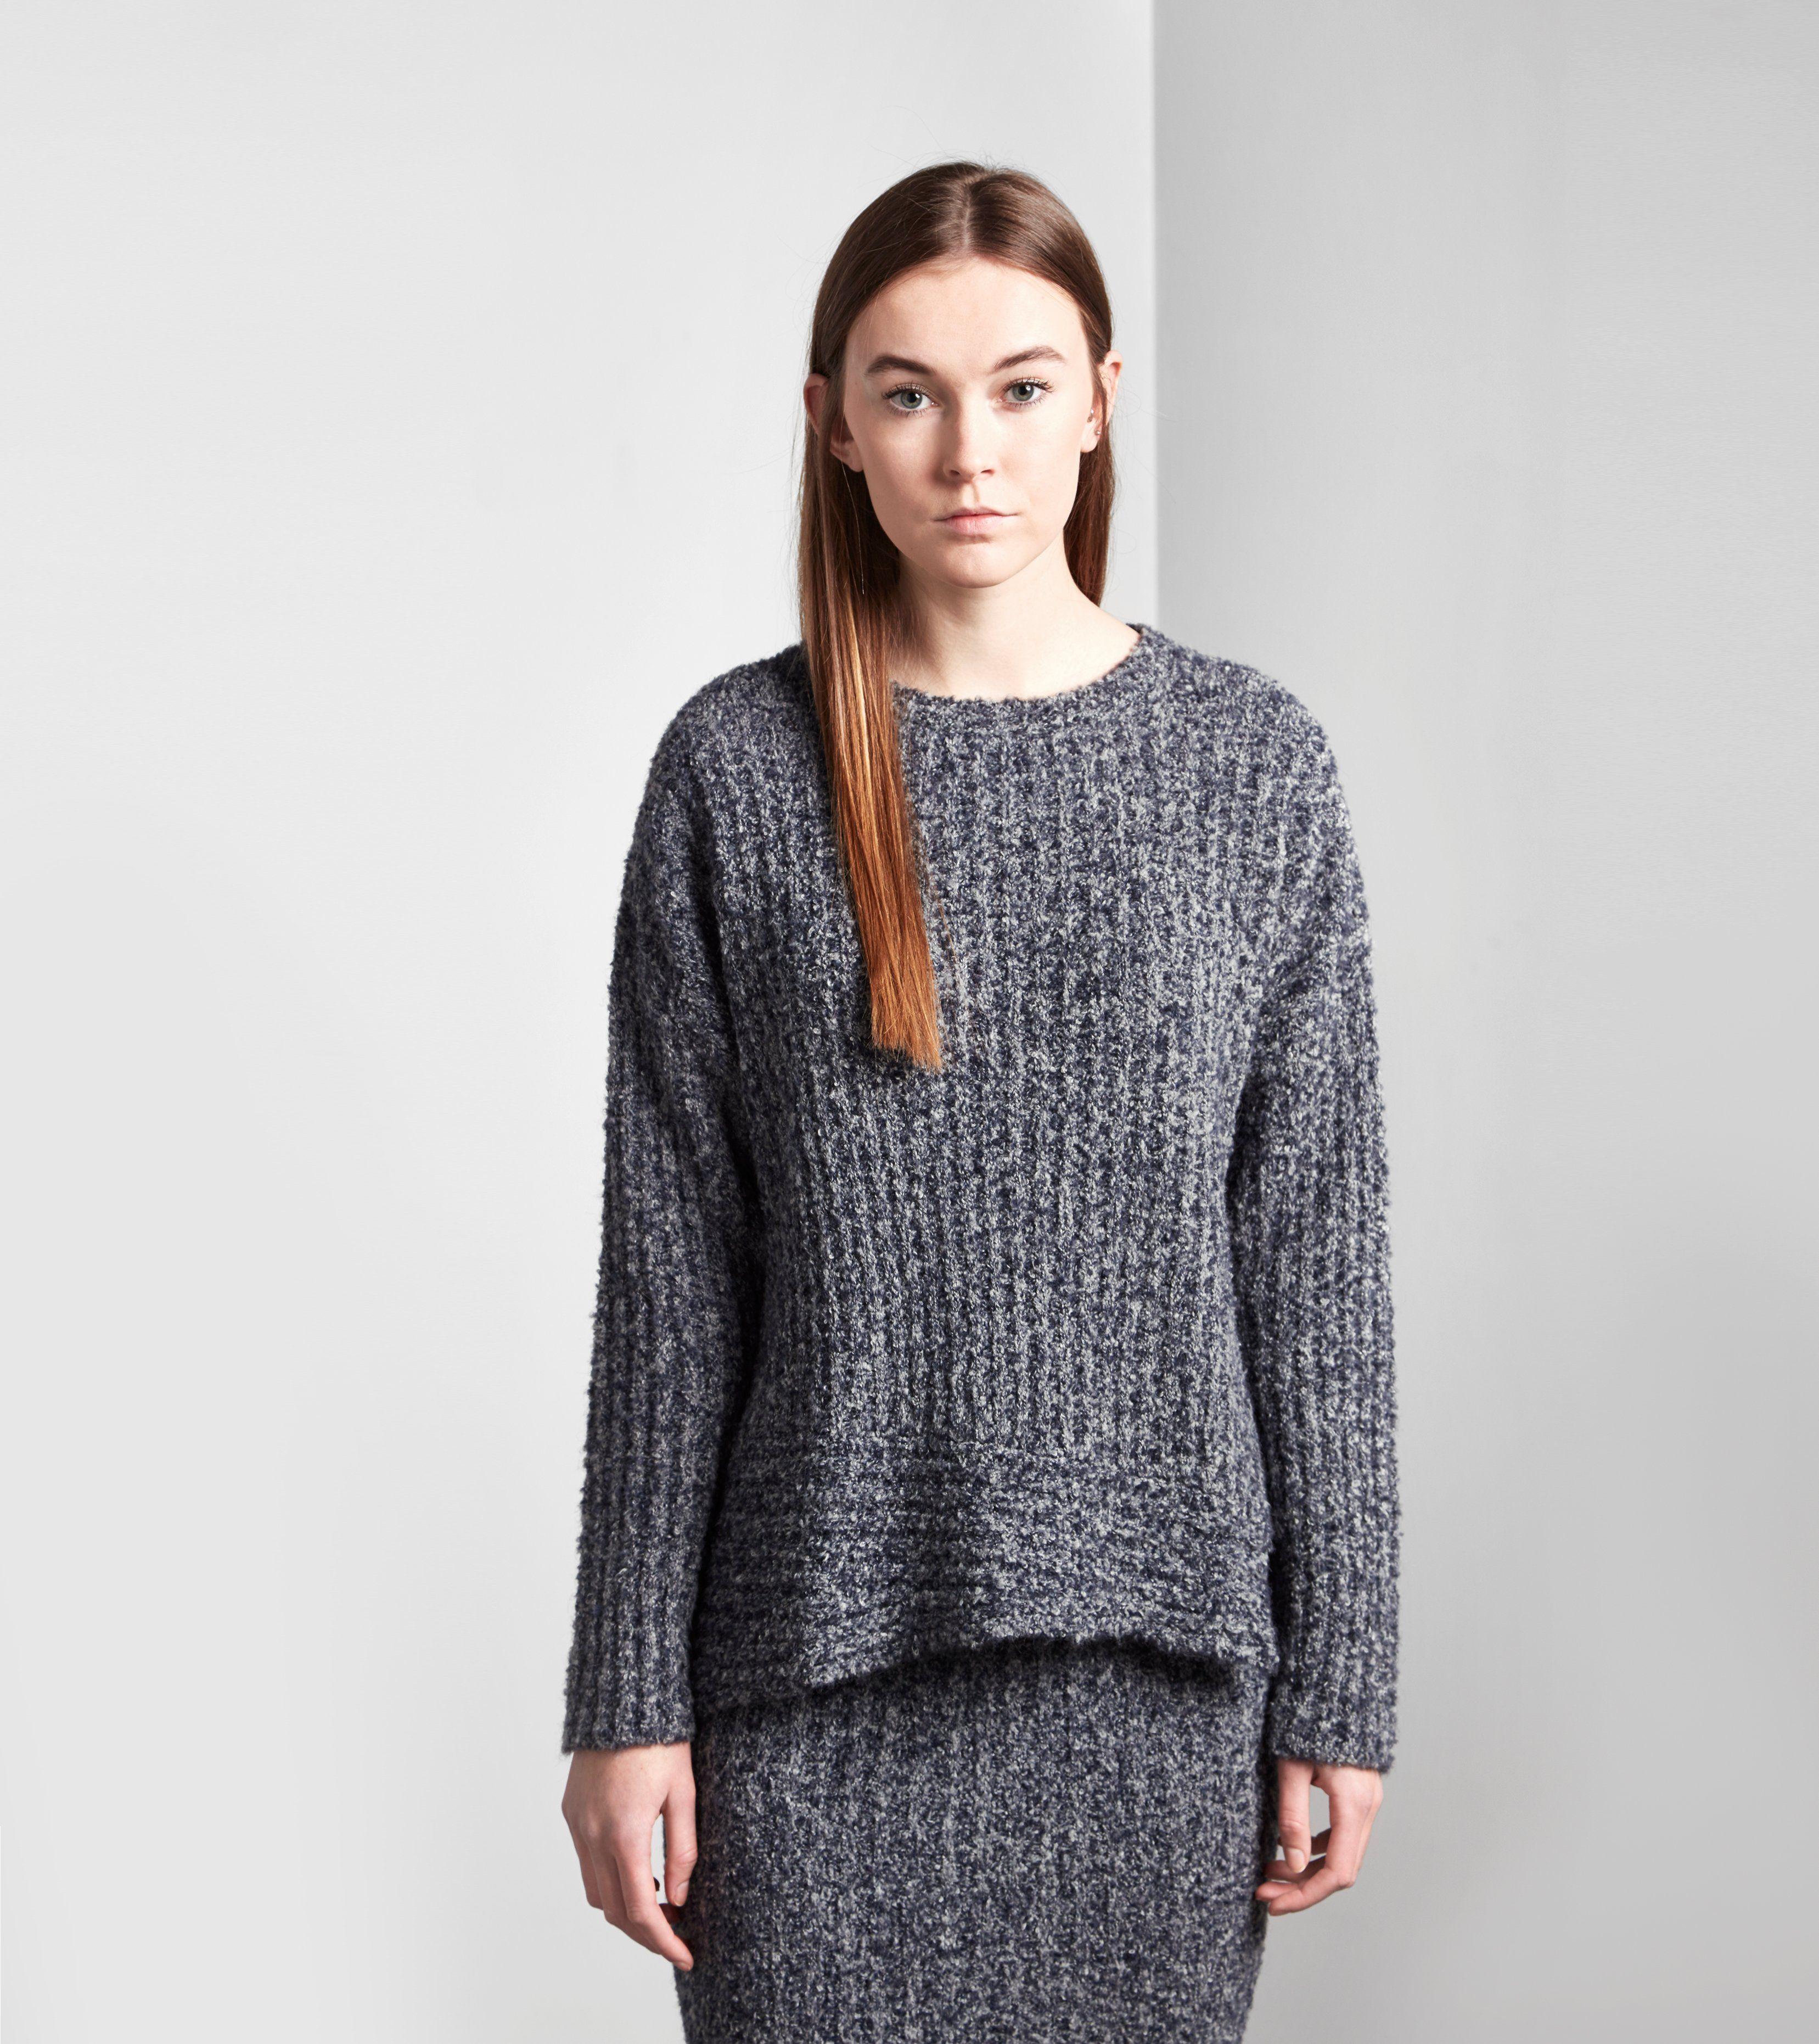 LIBERTINE-LIBERTINE Dee Knitted Jumper